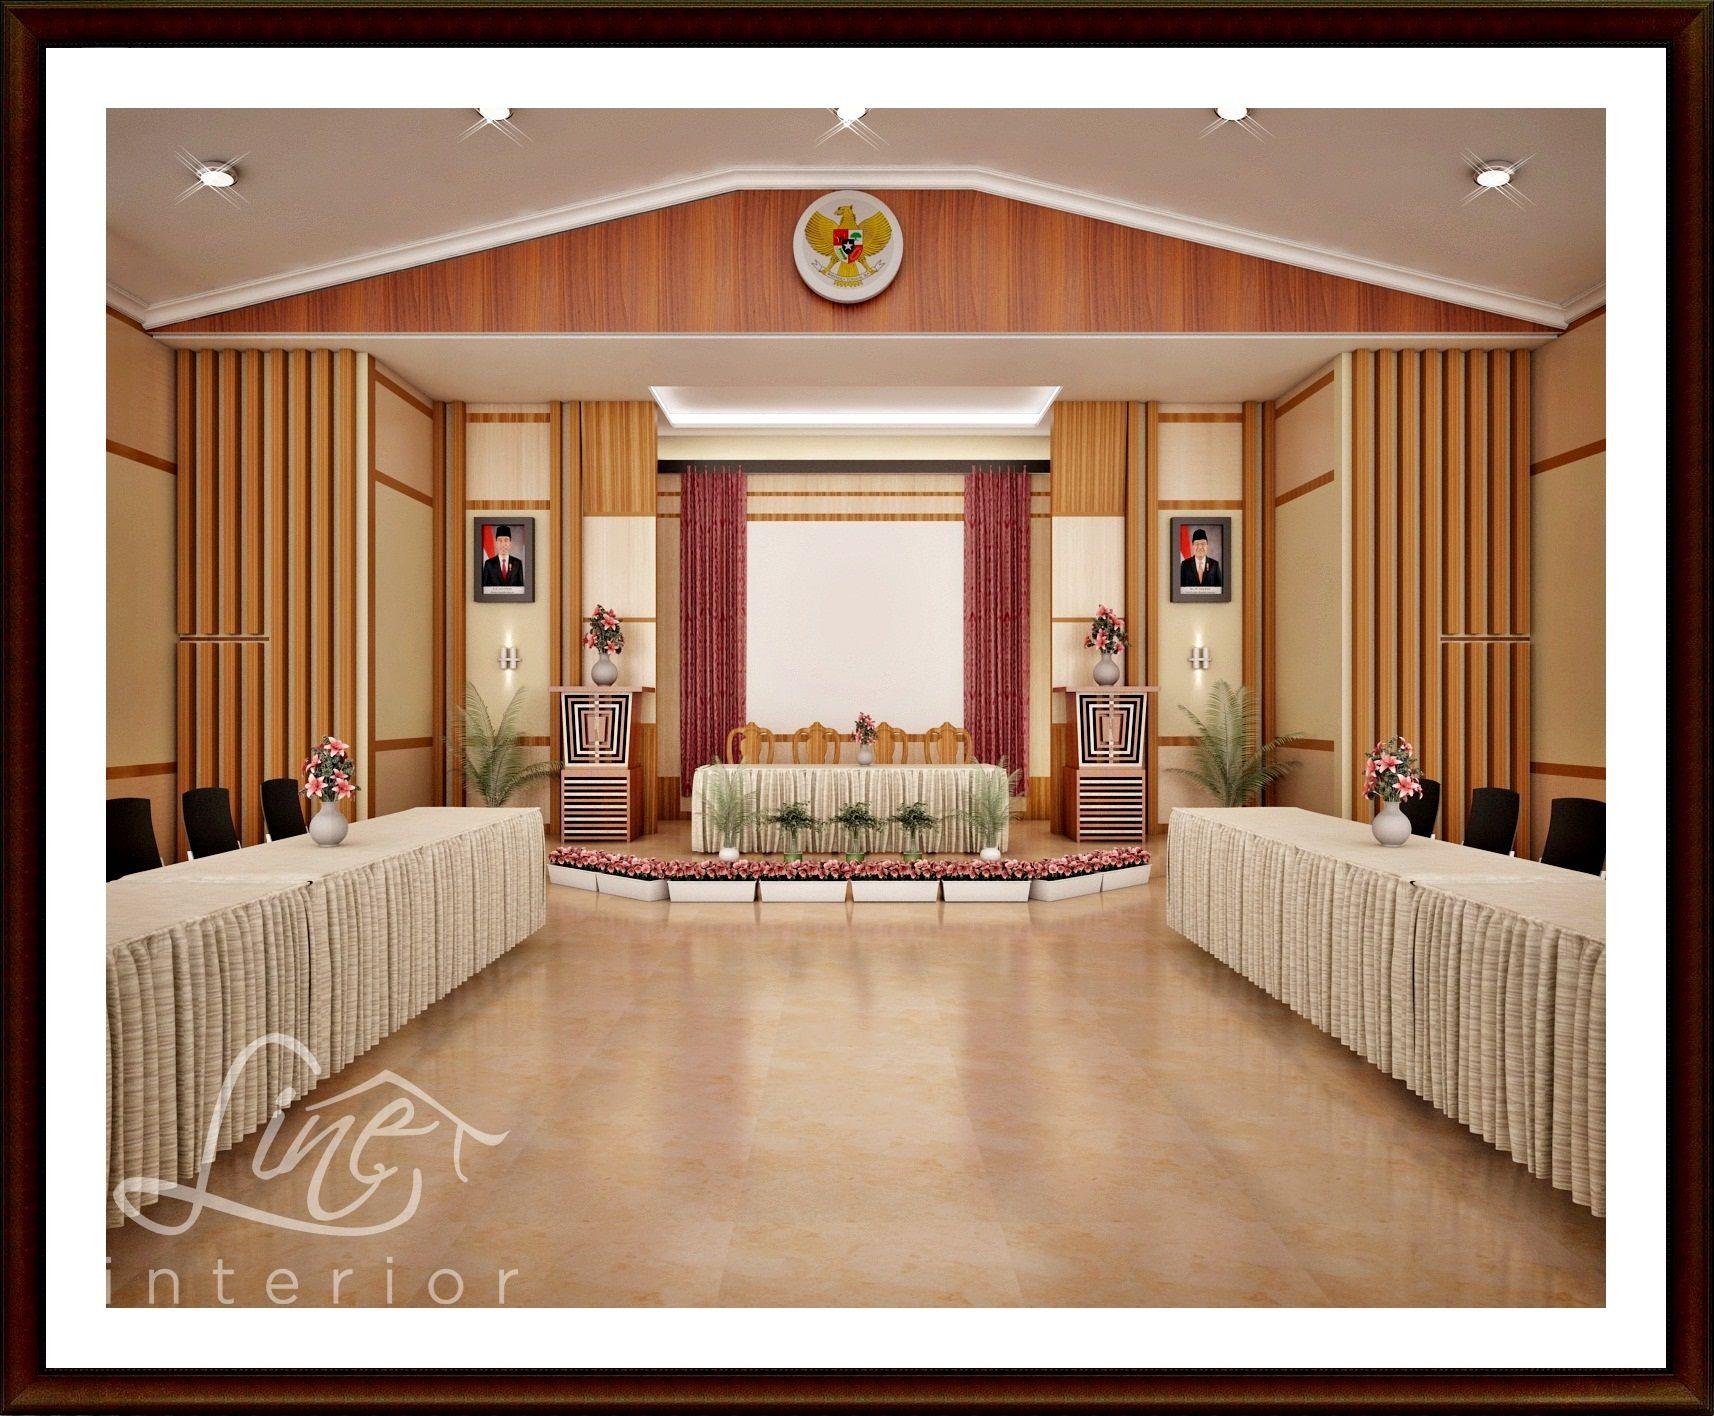 Project aula balai pertanian 0822 3644 4481 0812 3320 for Kitchen set surabaya